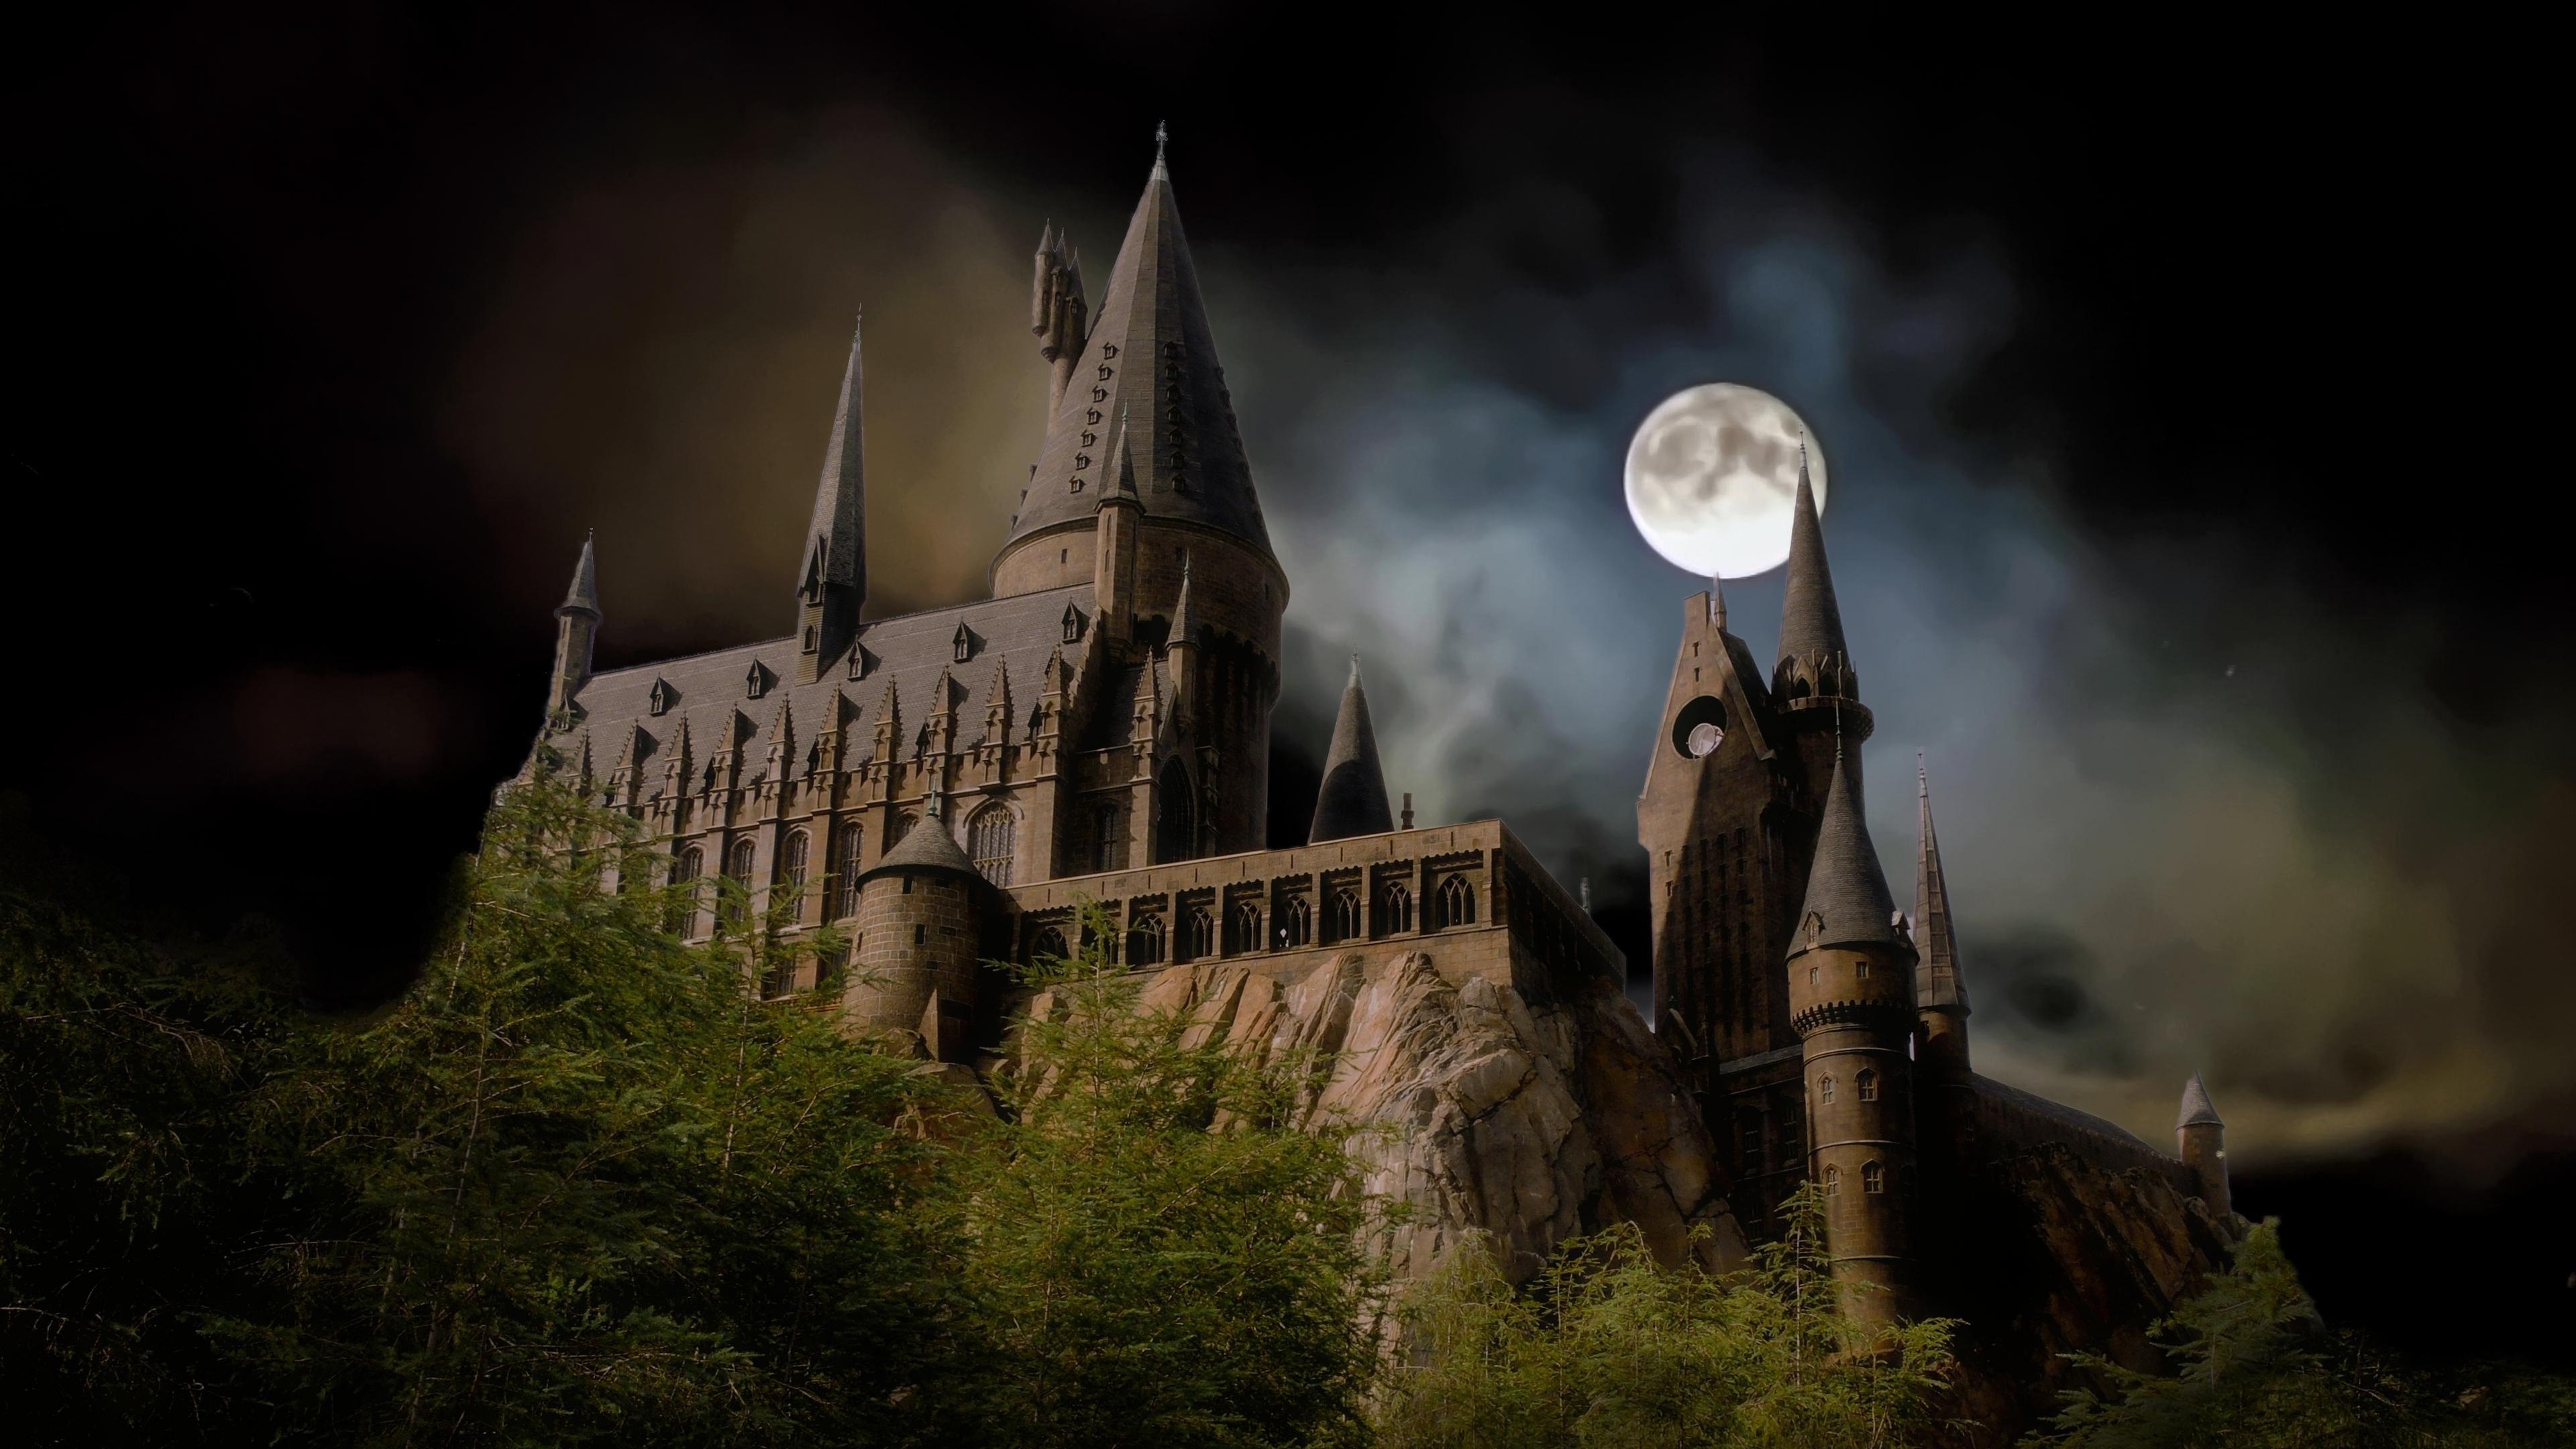 Hogwarts Castle Universal Orlando 4k Wallpaper Hogwarts Castle Hogwarts Harry Potter Hogwarts Castle Wallpaper